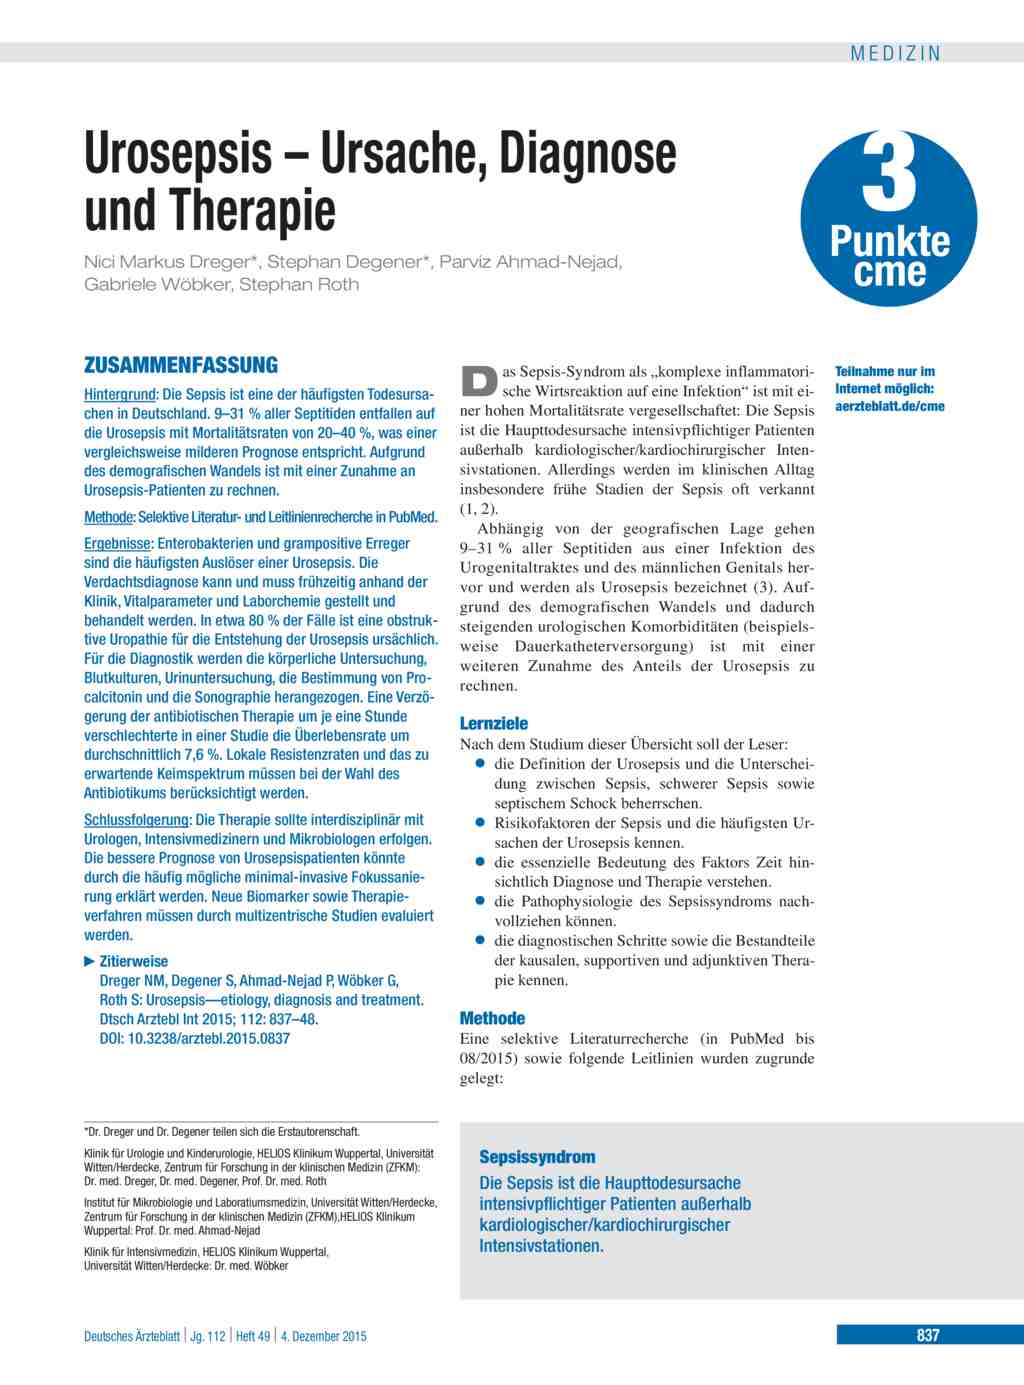 Urosepsis – Ursache, Diagnose und Therapie